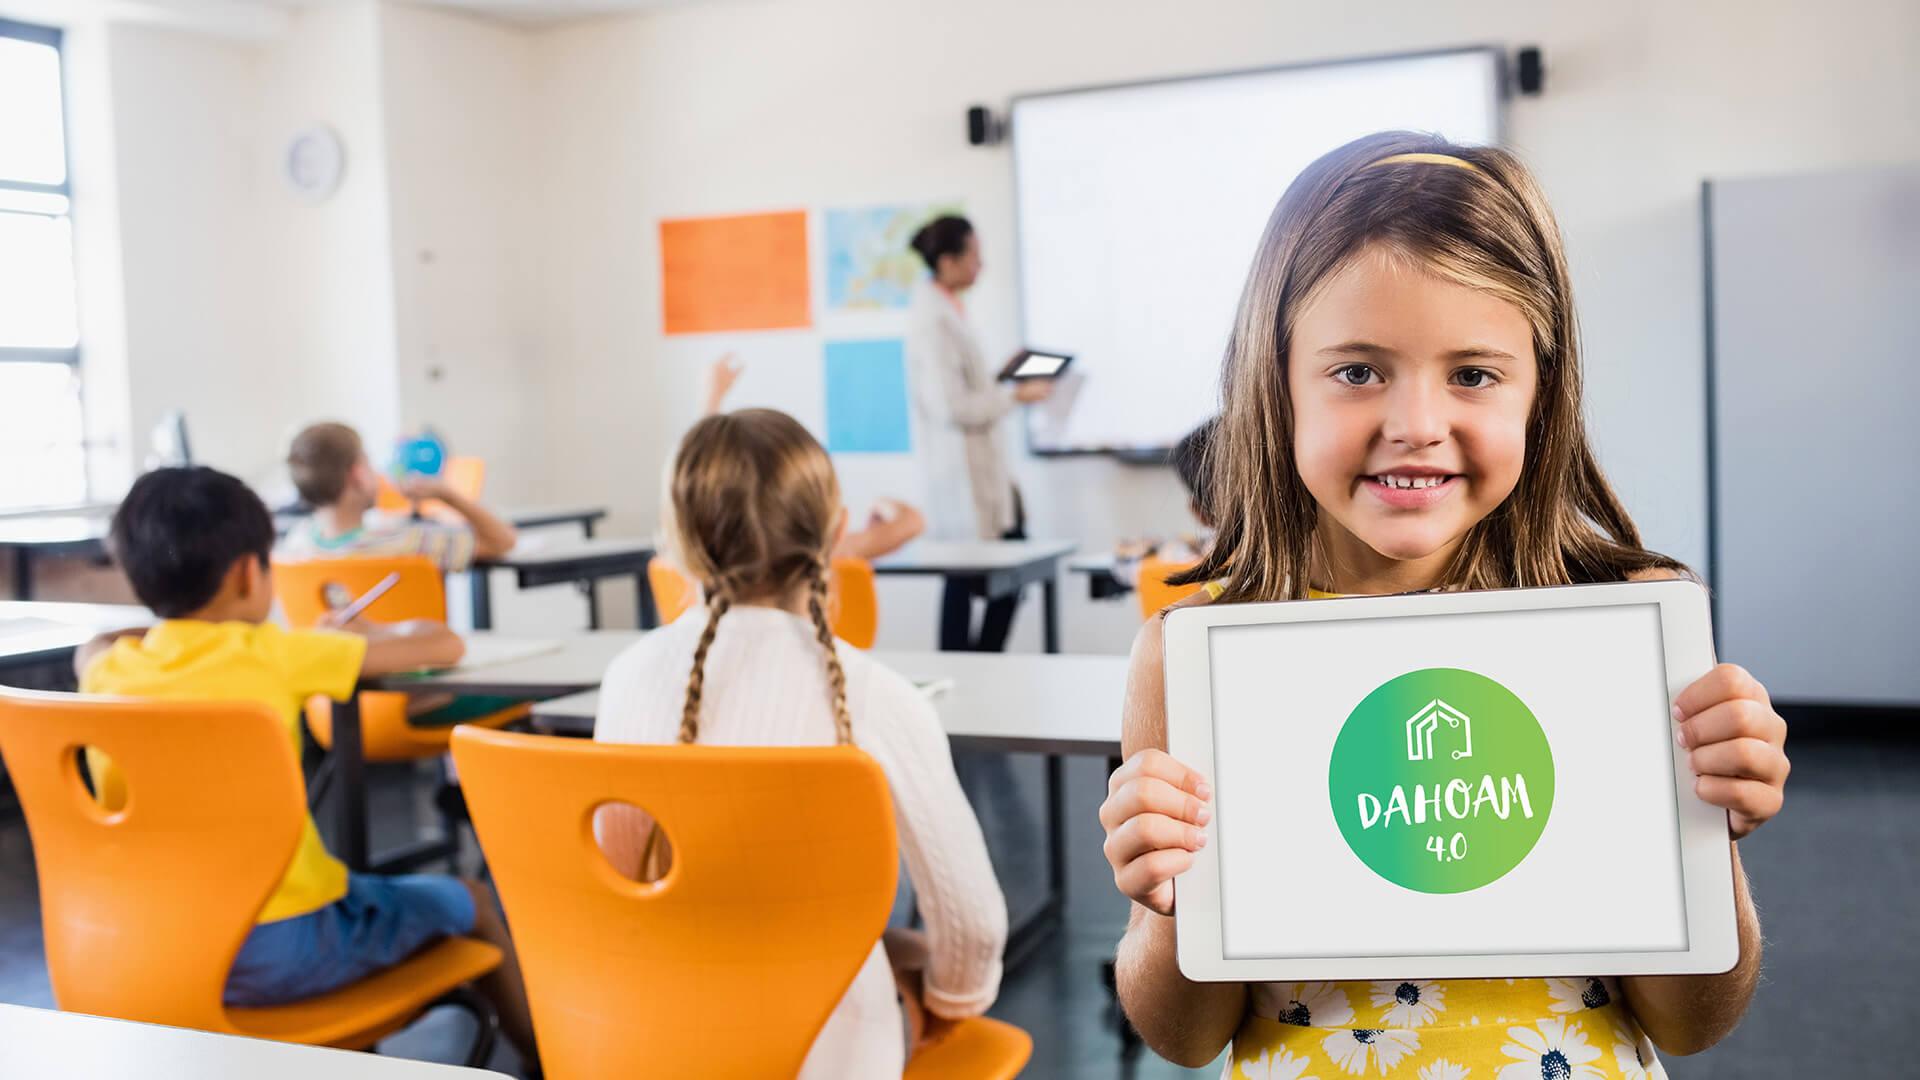 Kind in Schule zeigt Tablet